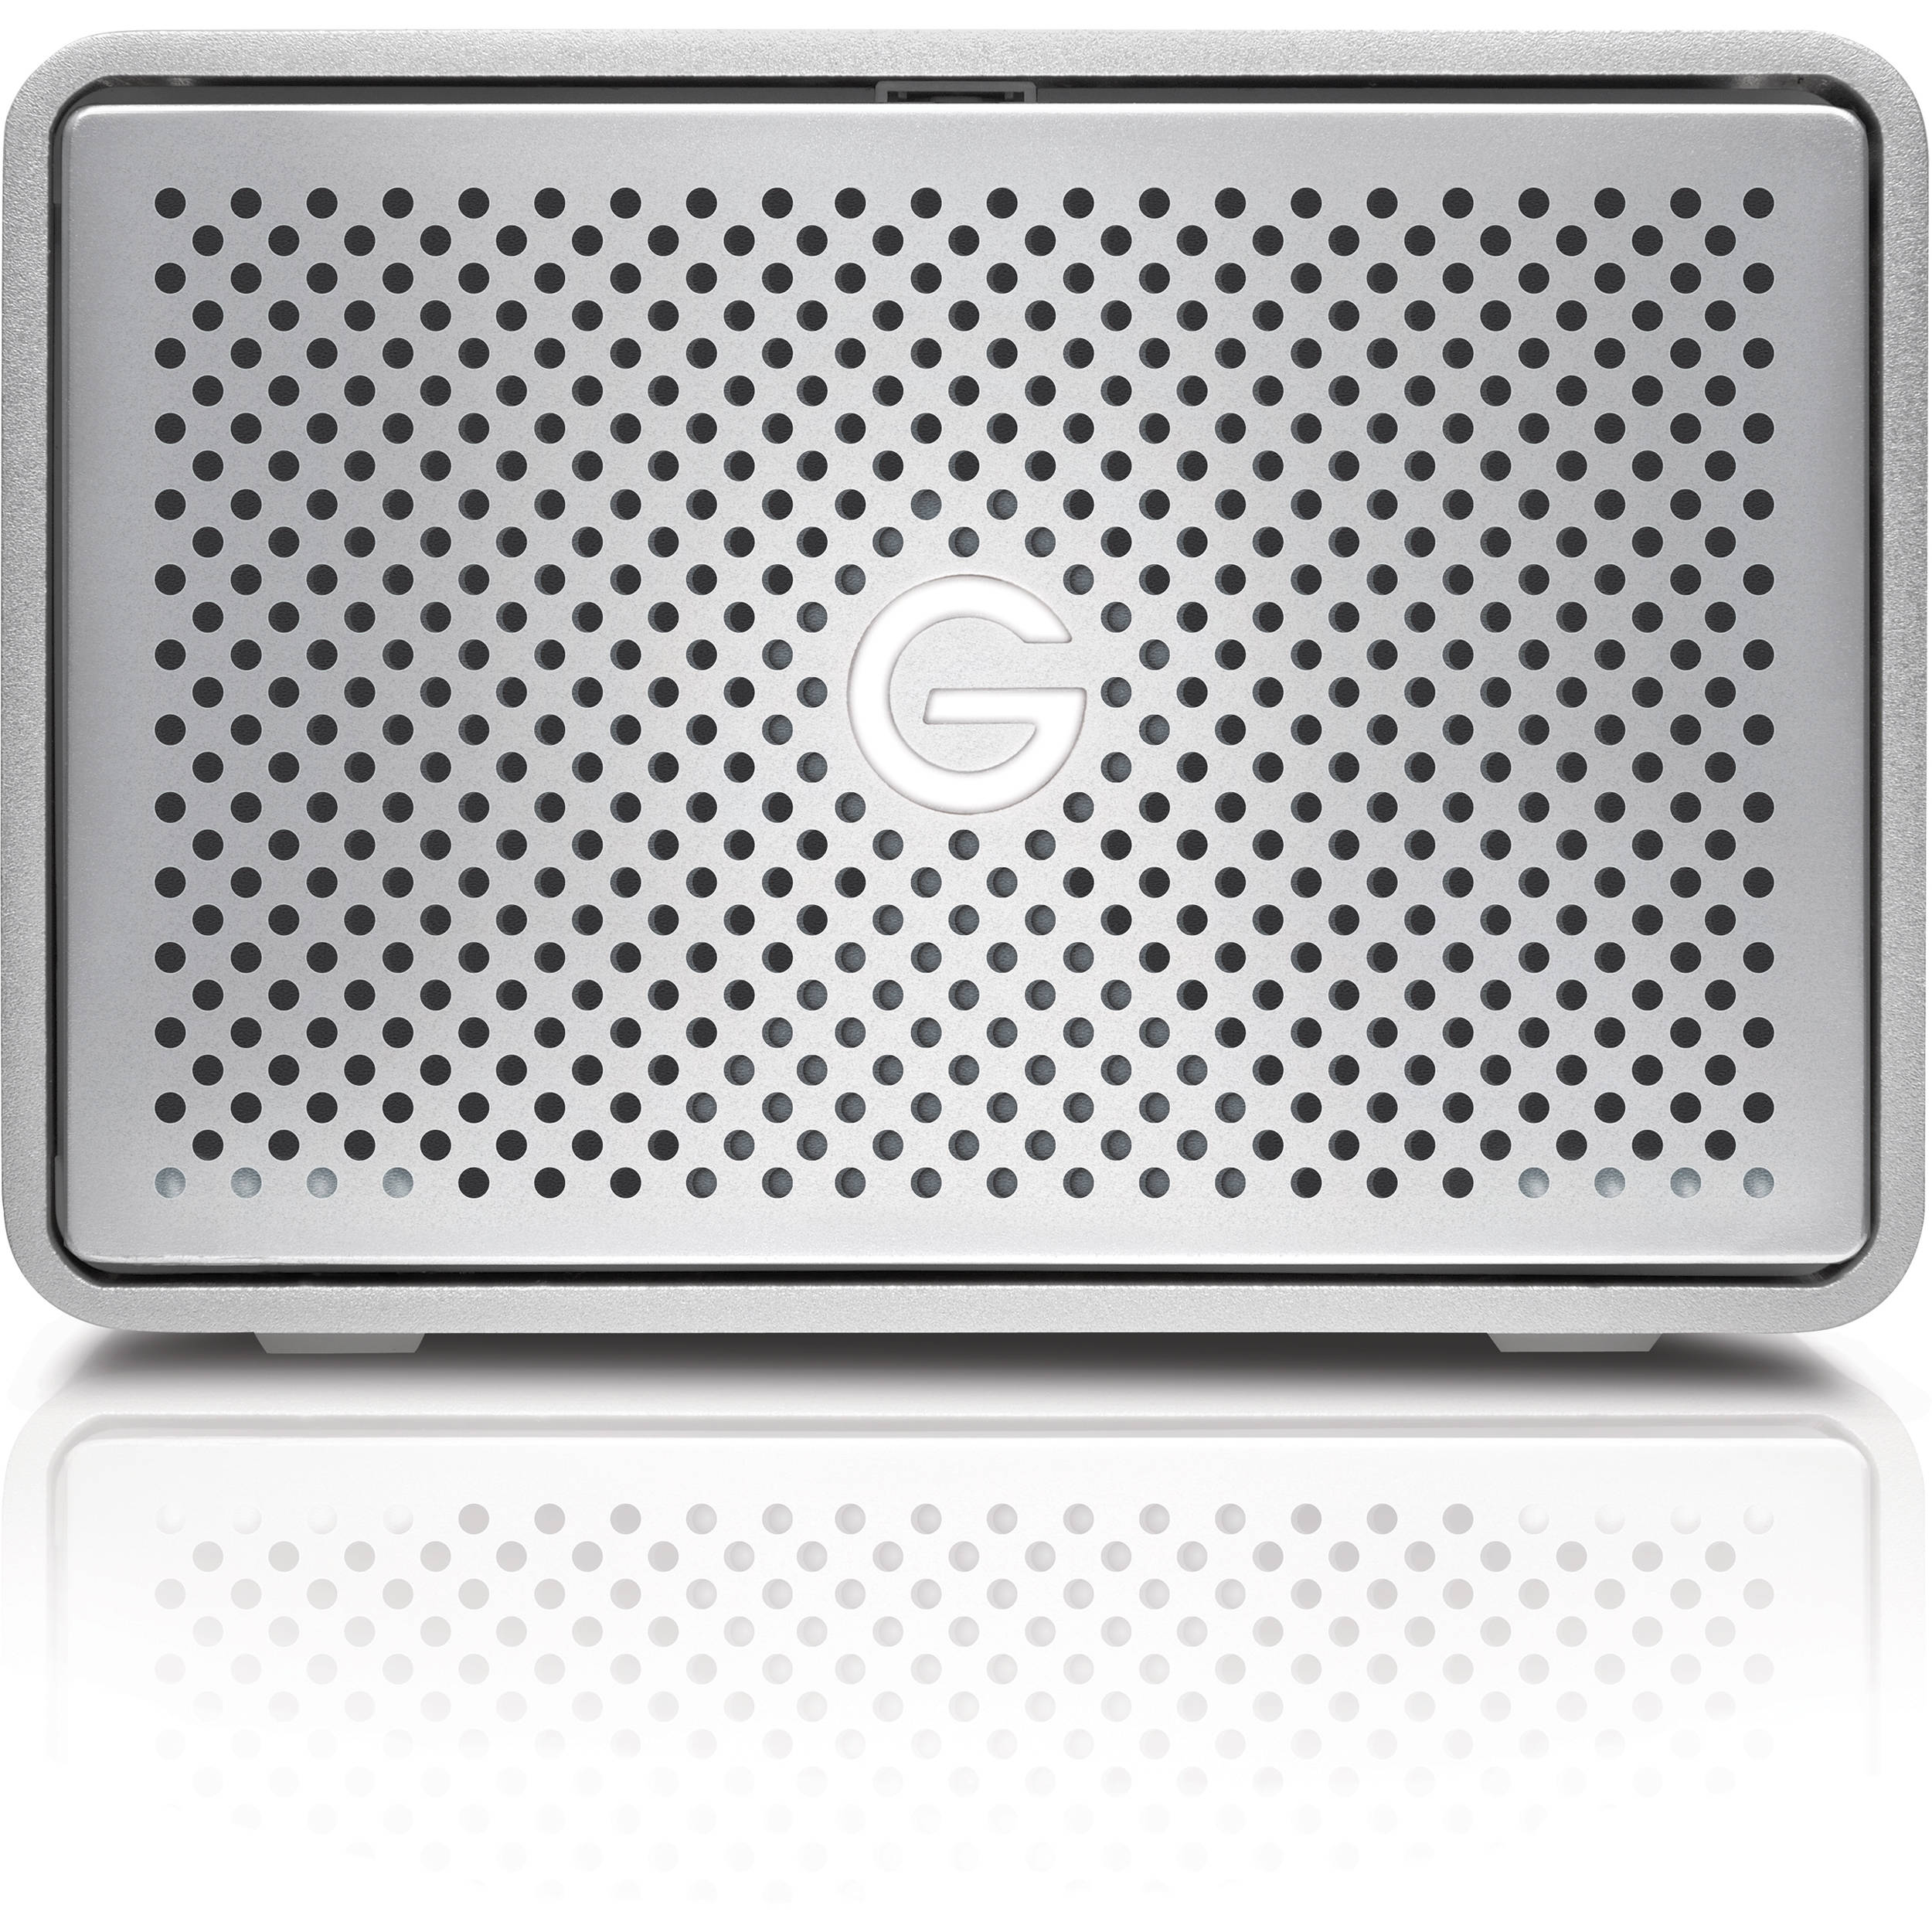 G Technology G Raid Usb G1 8tb Removable Dual Drive